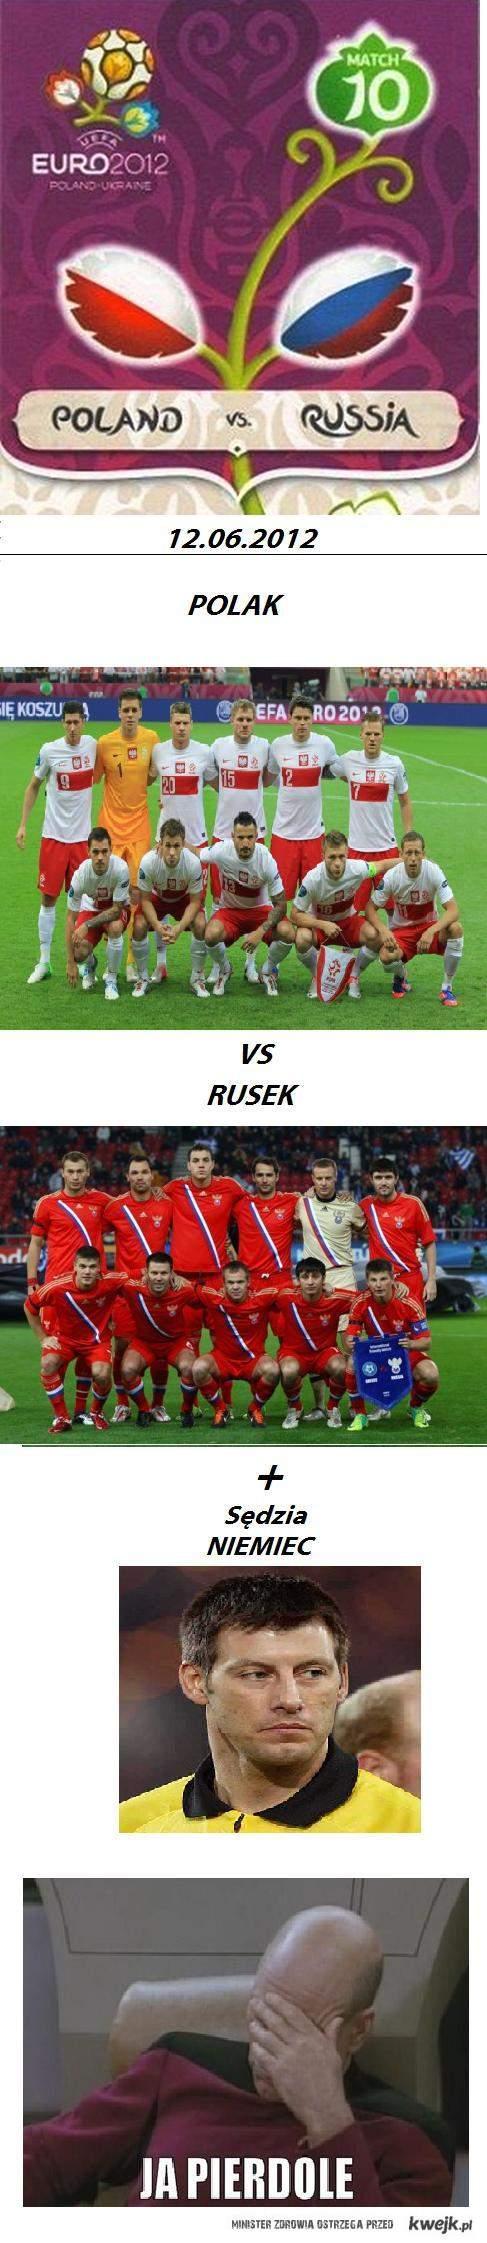 Polak, Rusek, Niemiec...